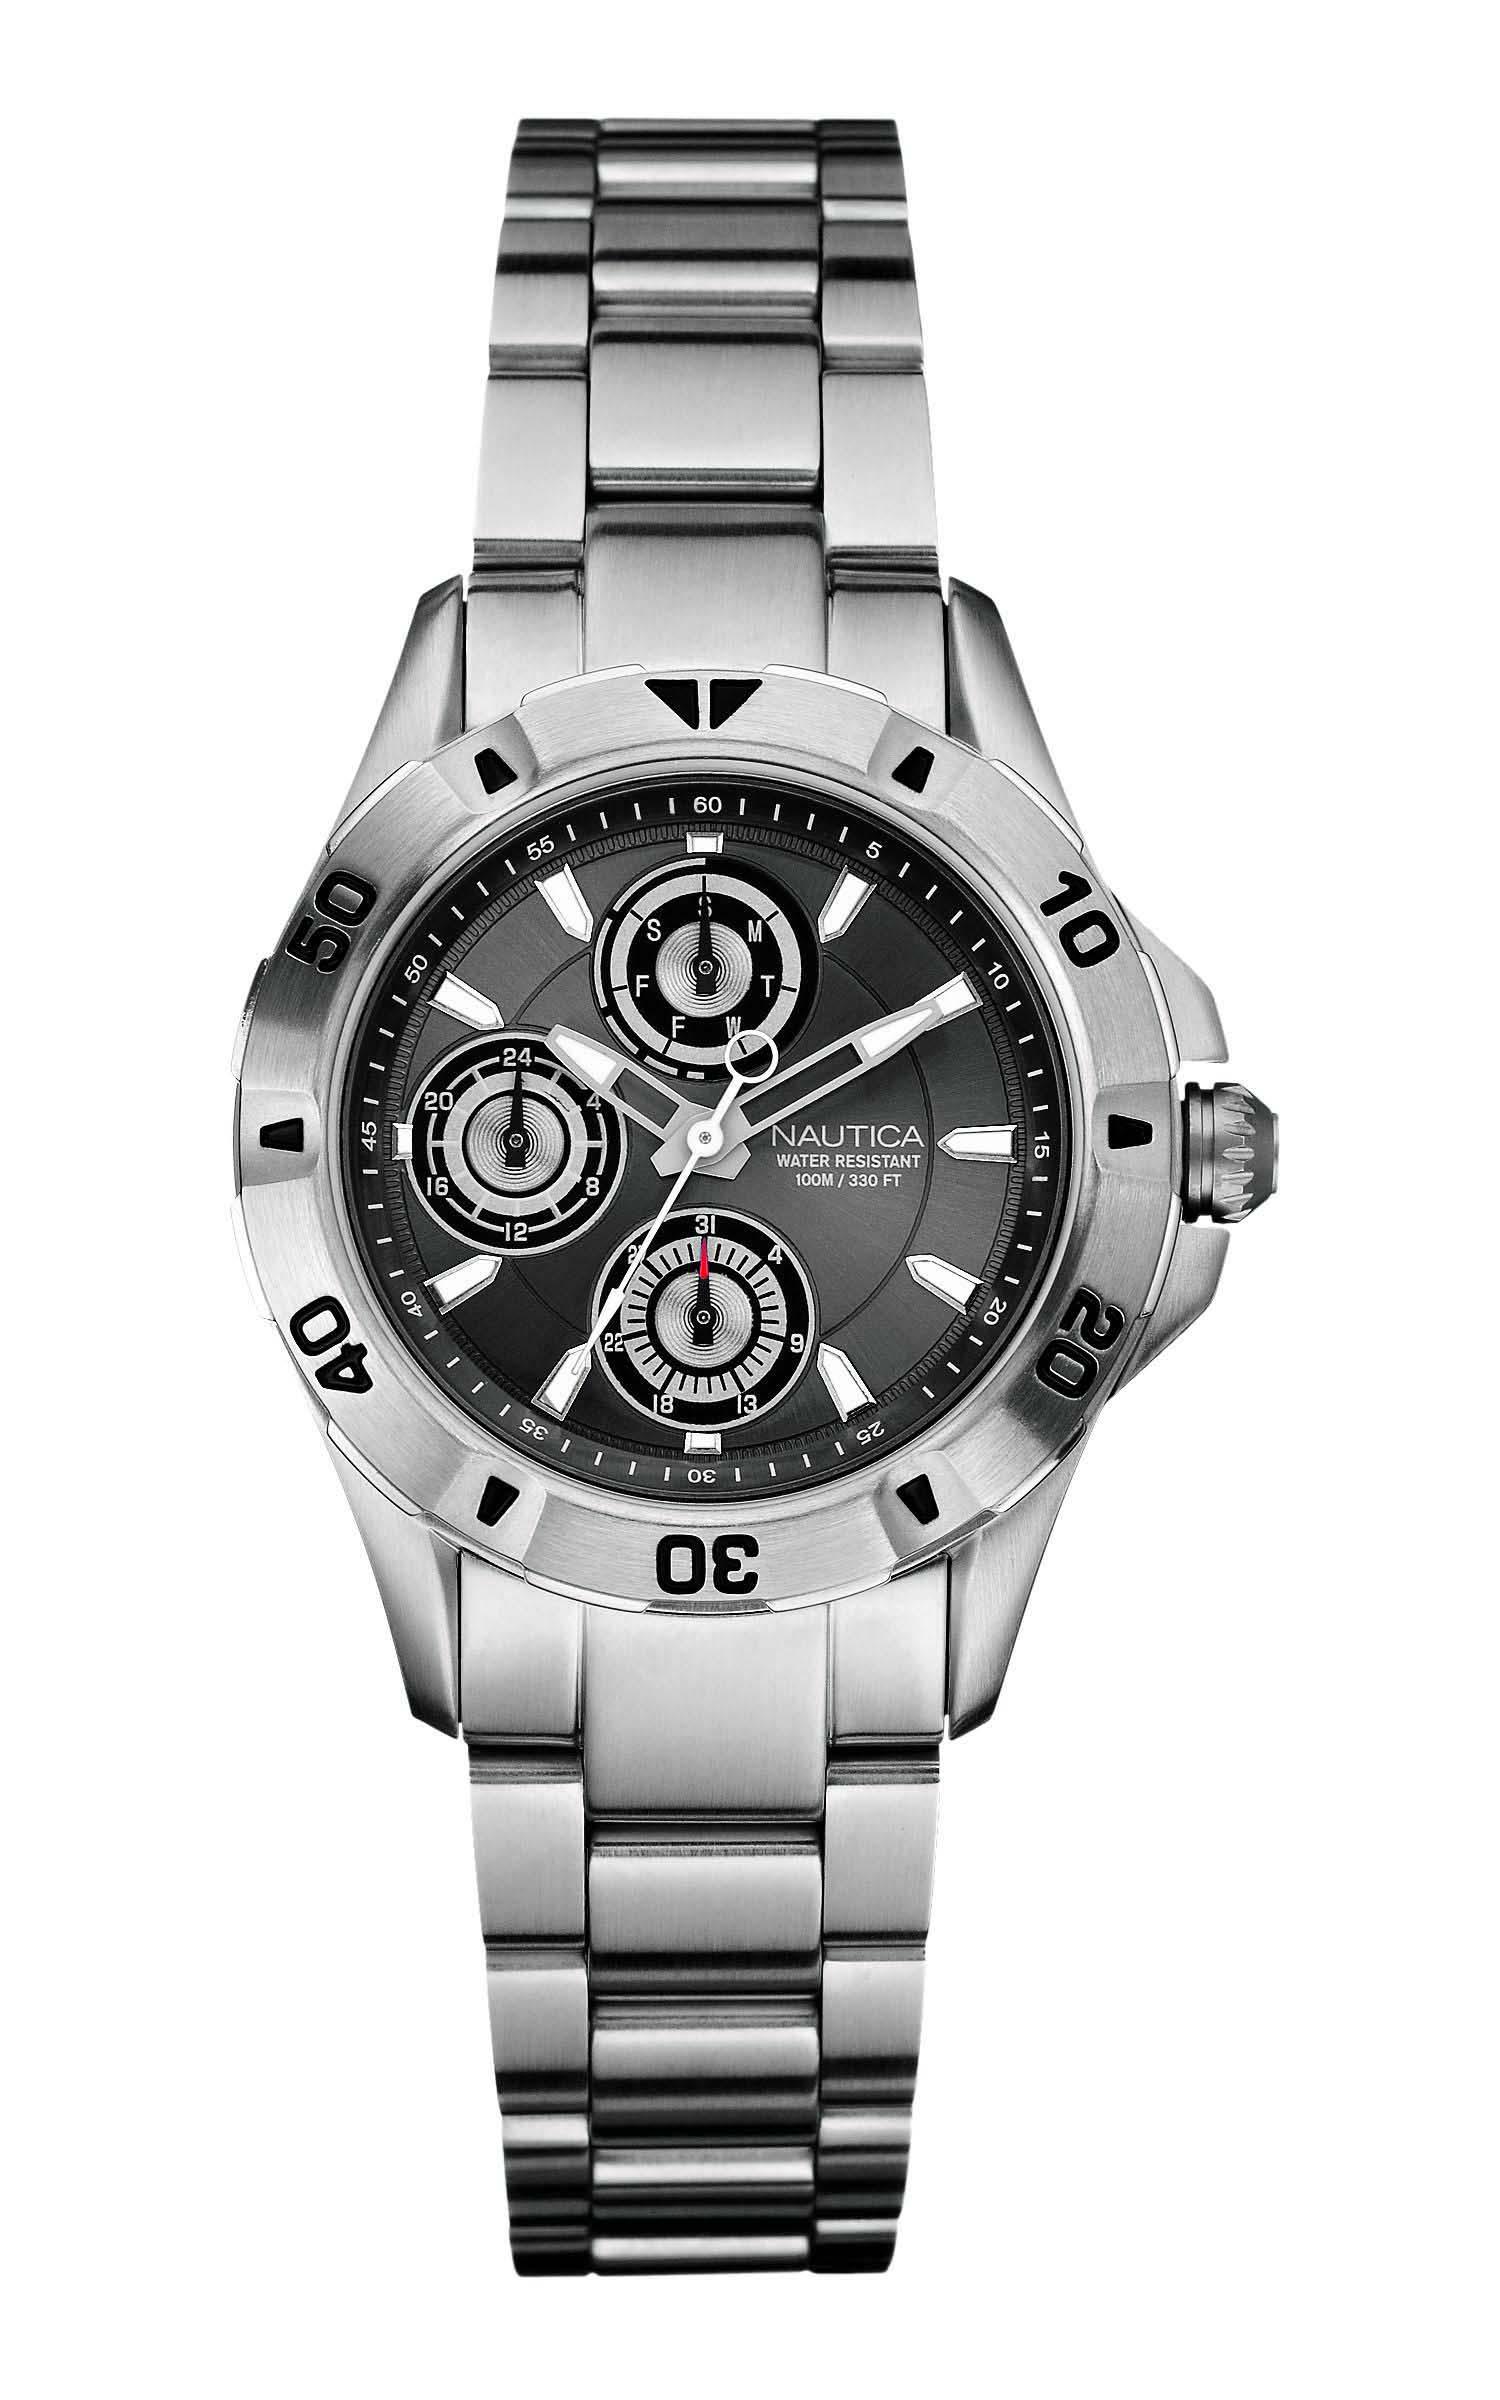 0c55eee7206 Relógio Nautica Masculino Aço - A16546M